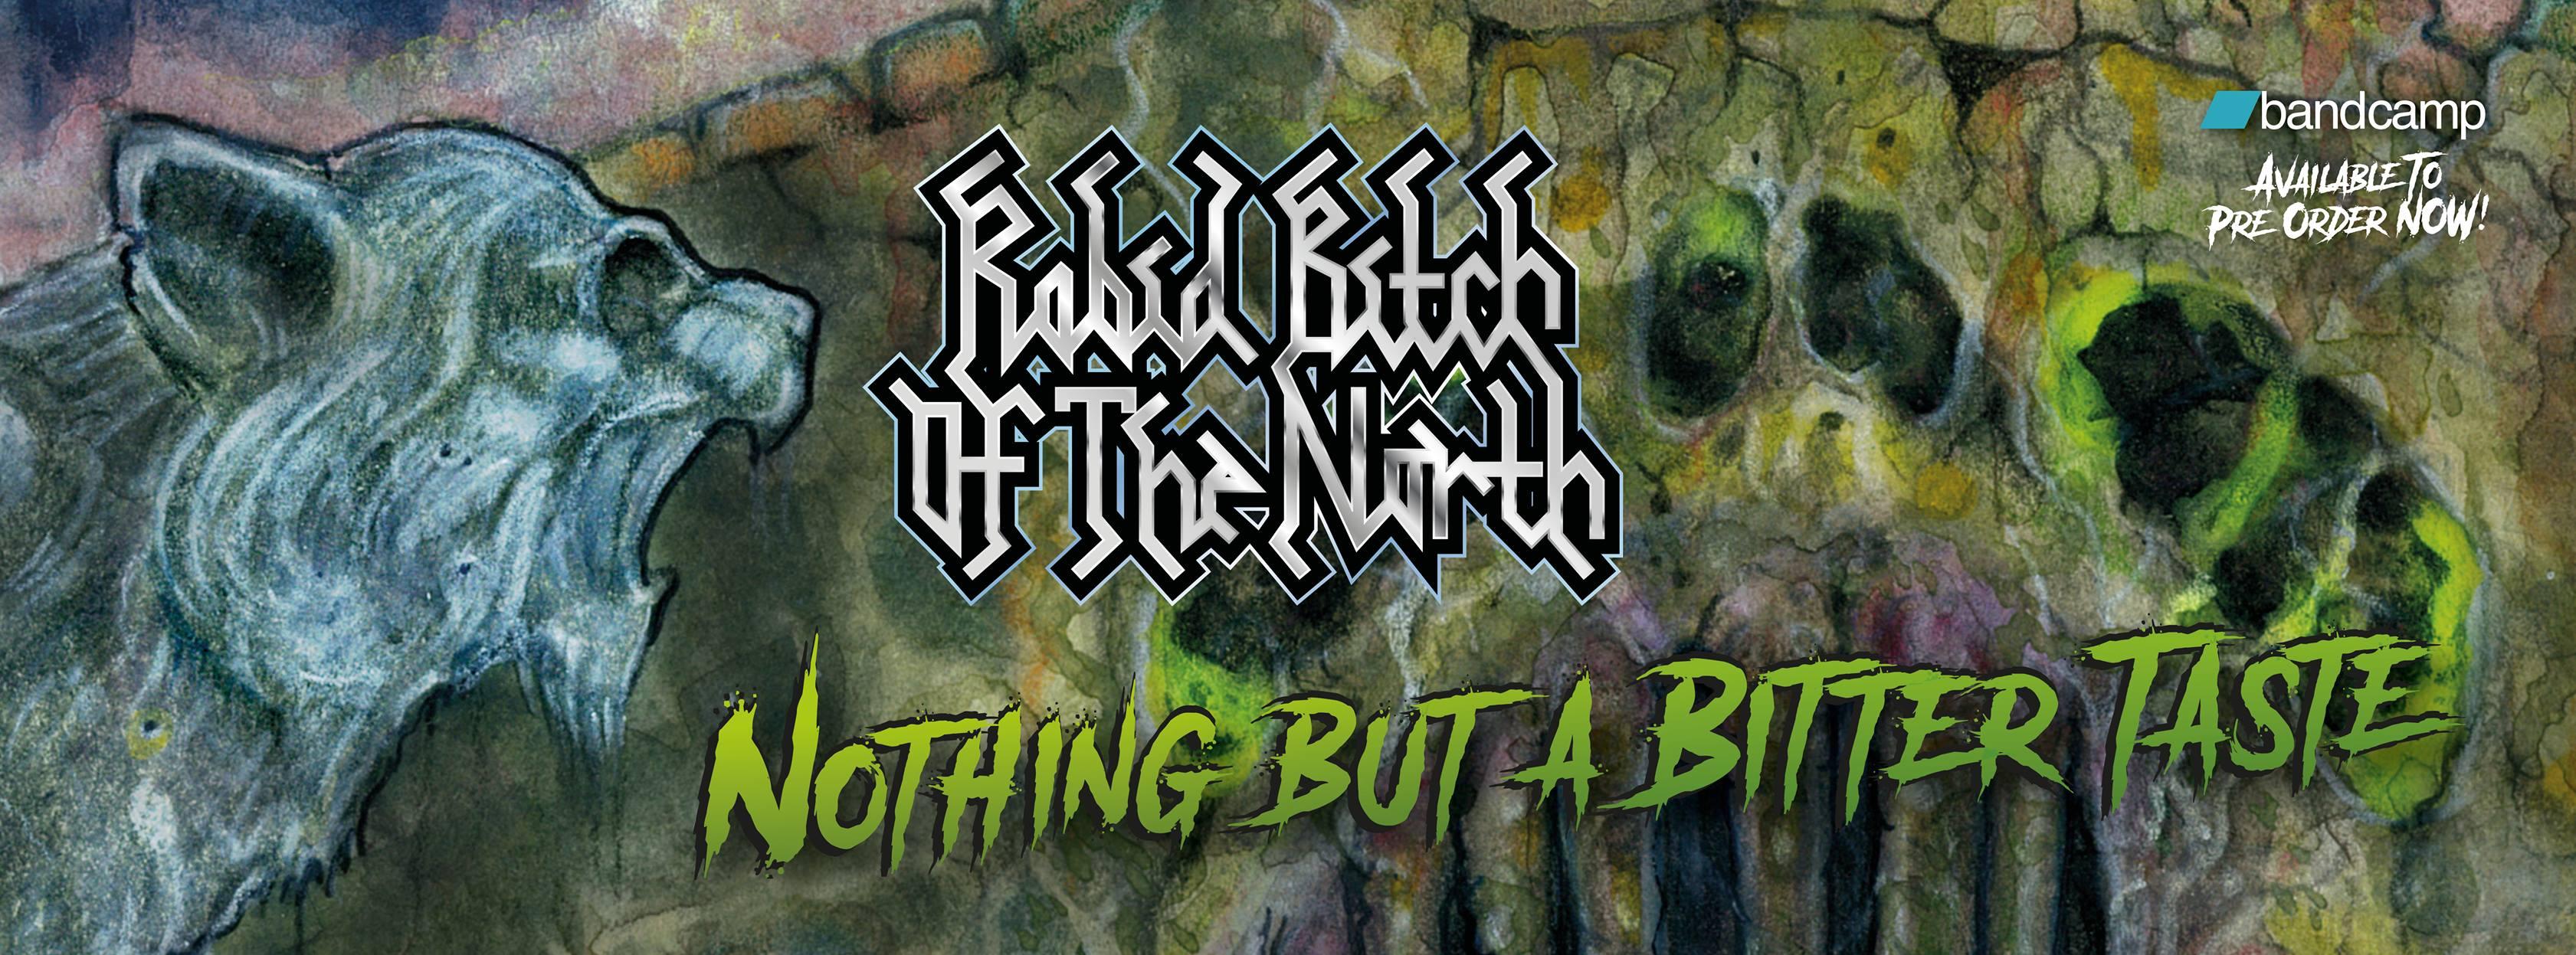 rabid bitch of the north